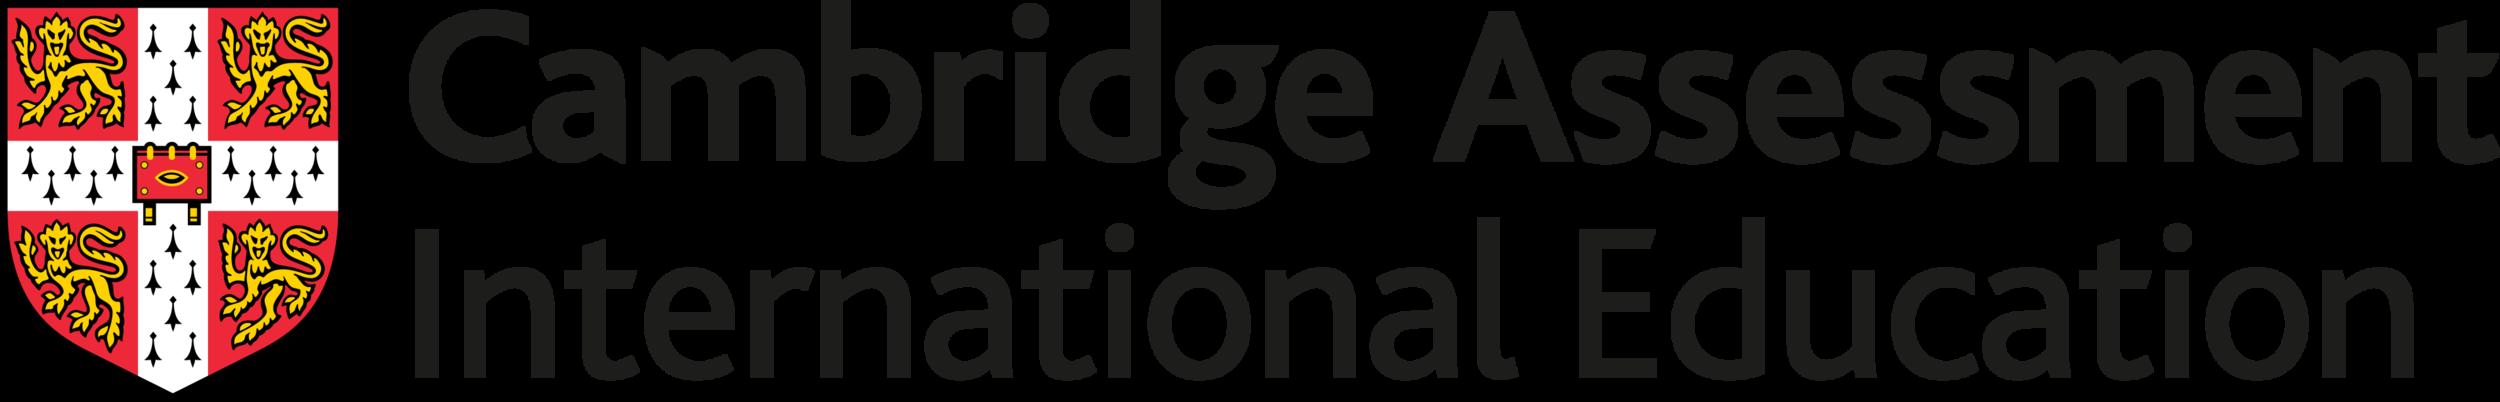 CAIE_logo_RGB (002).png